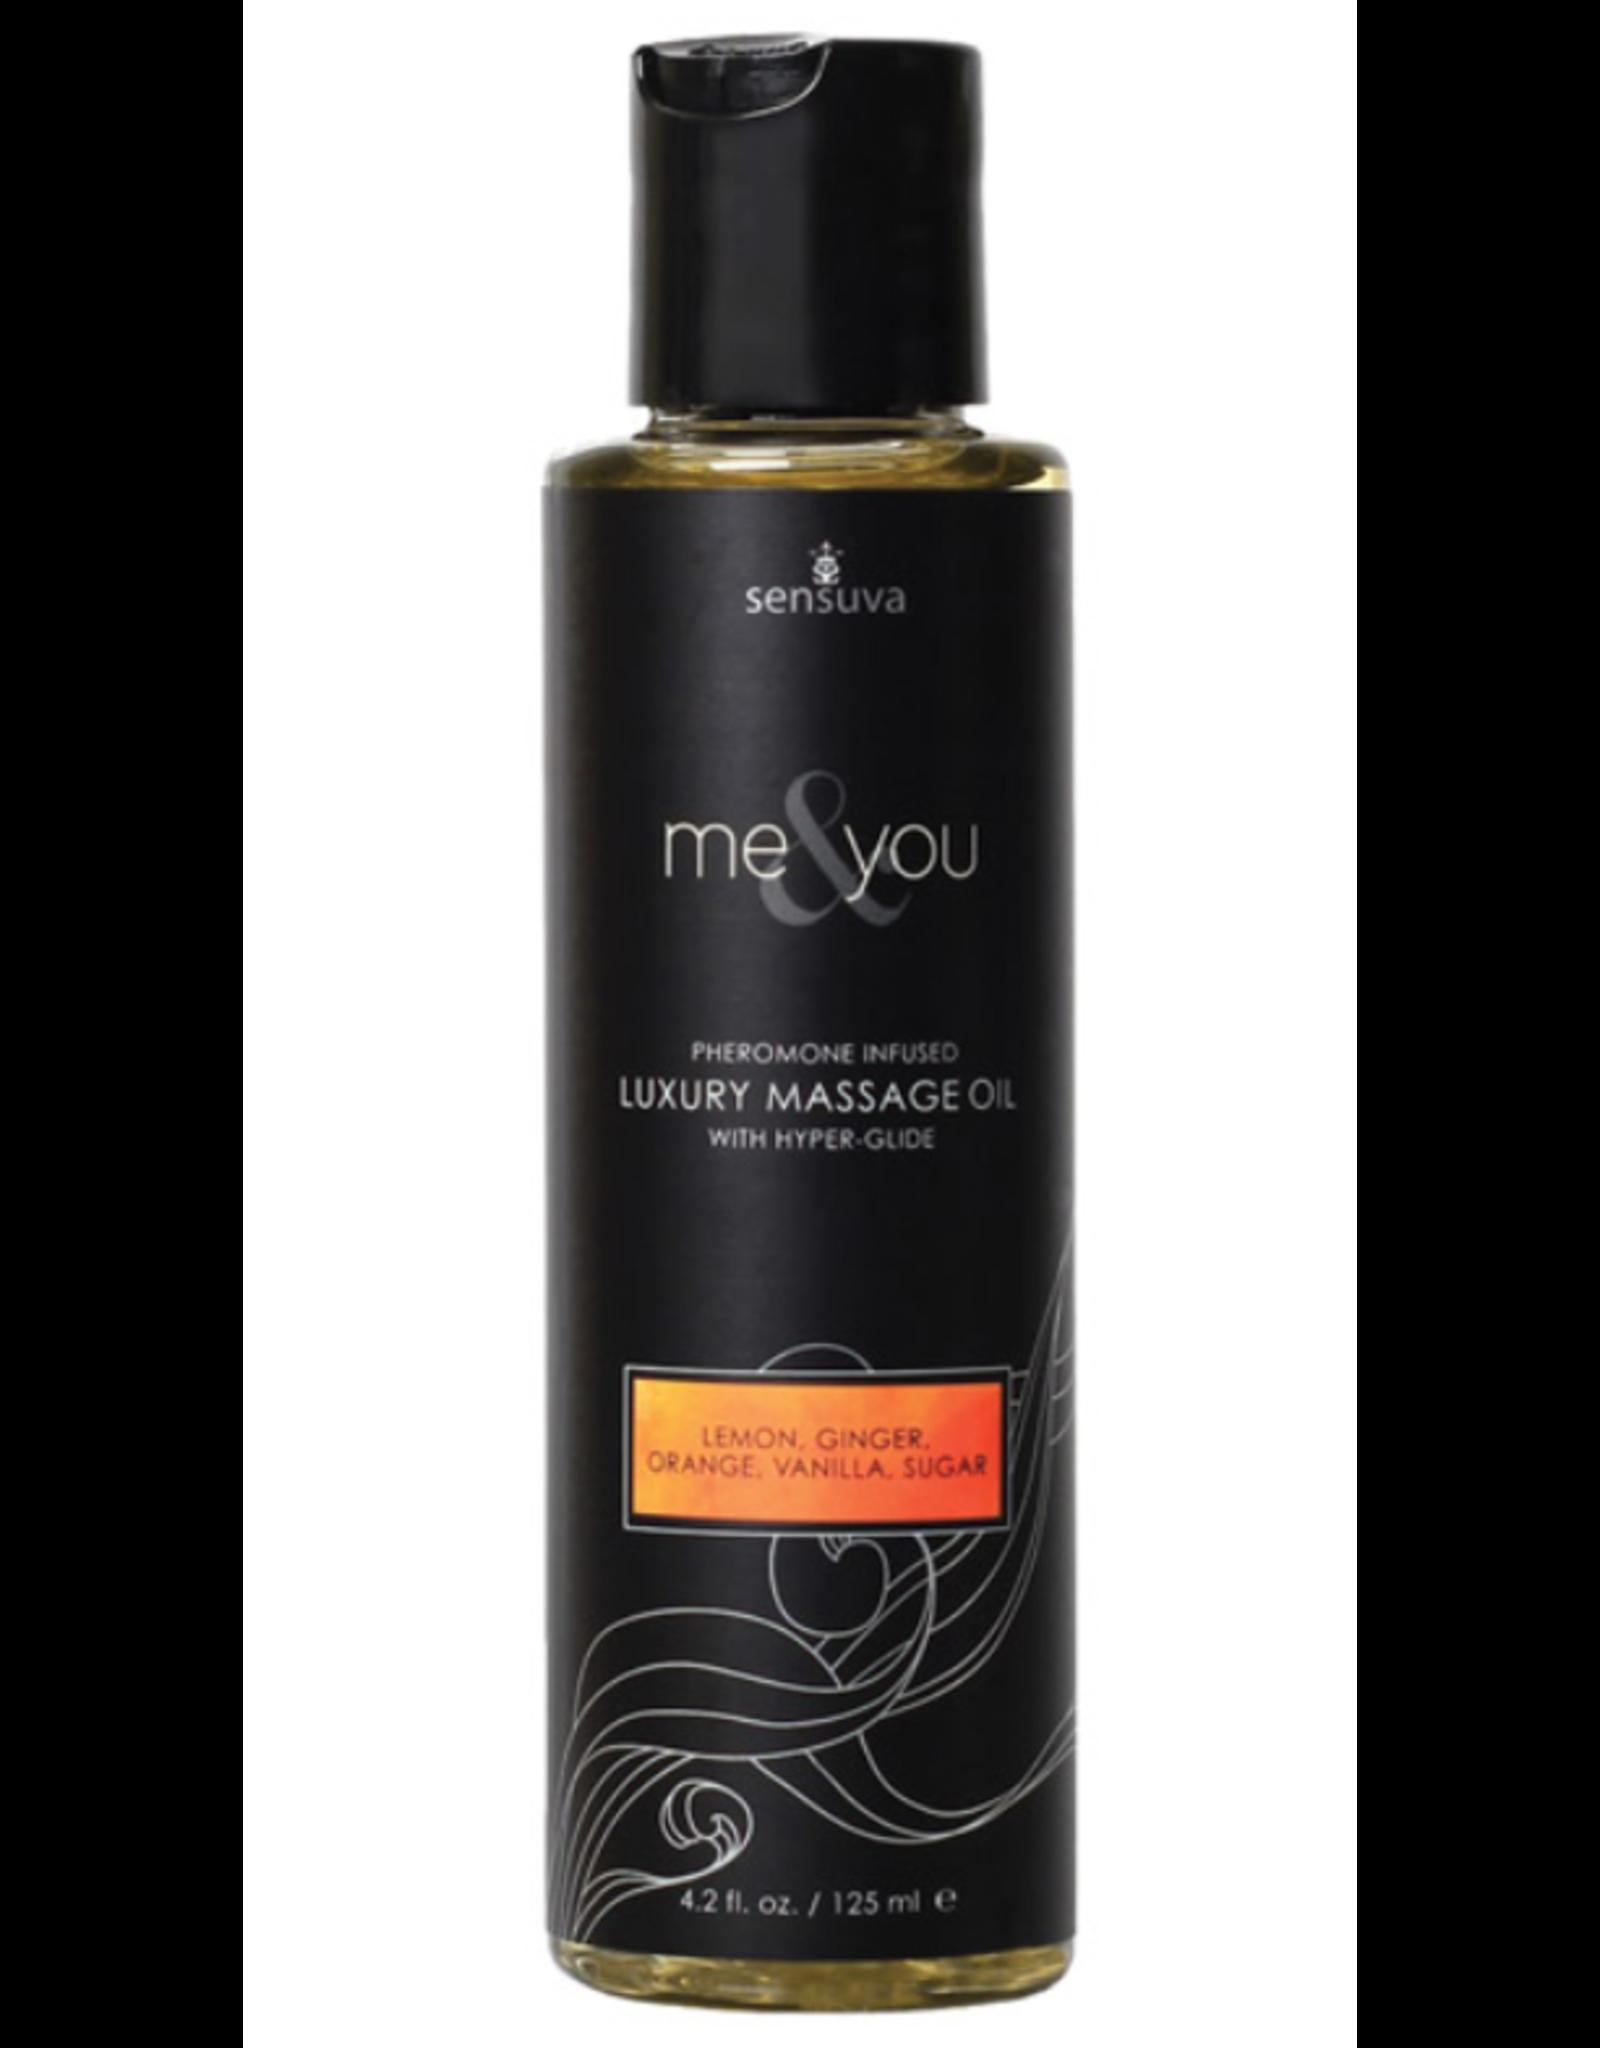 Sensuva Me & You Massage Oil - 4.2 oz Lemon, Ginger, Orange, Vanilla, Sugar